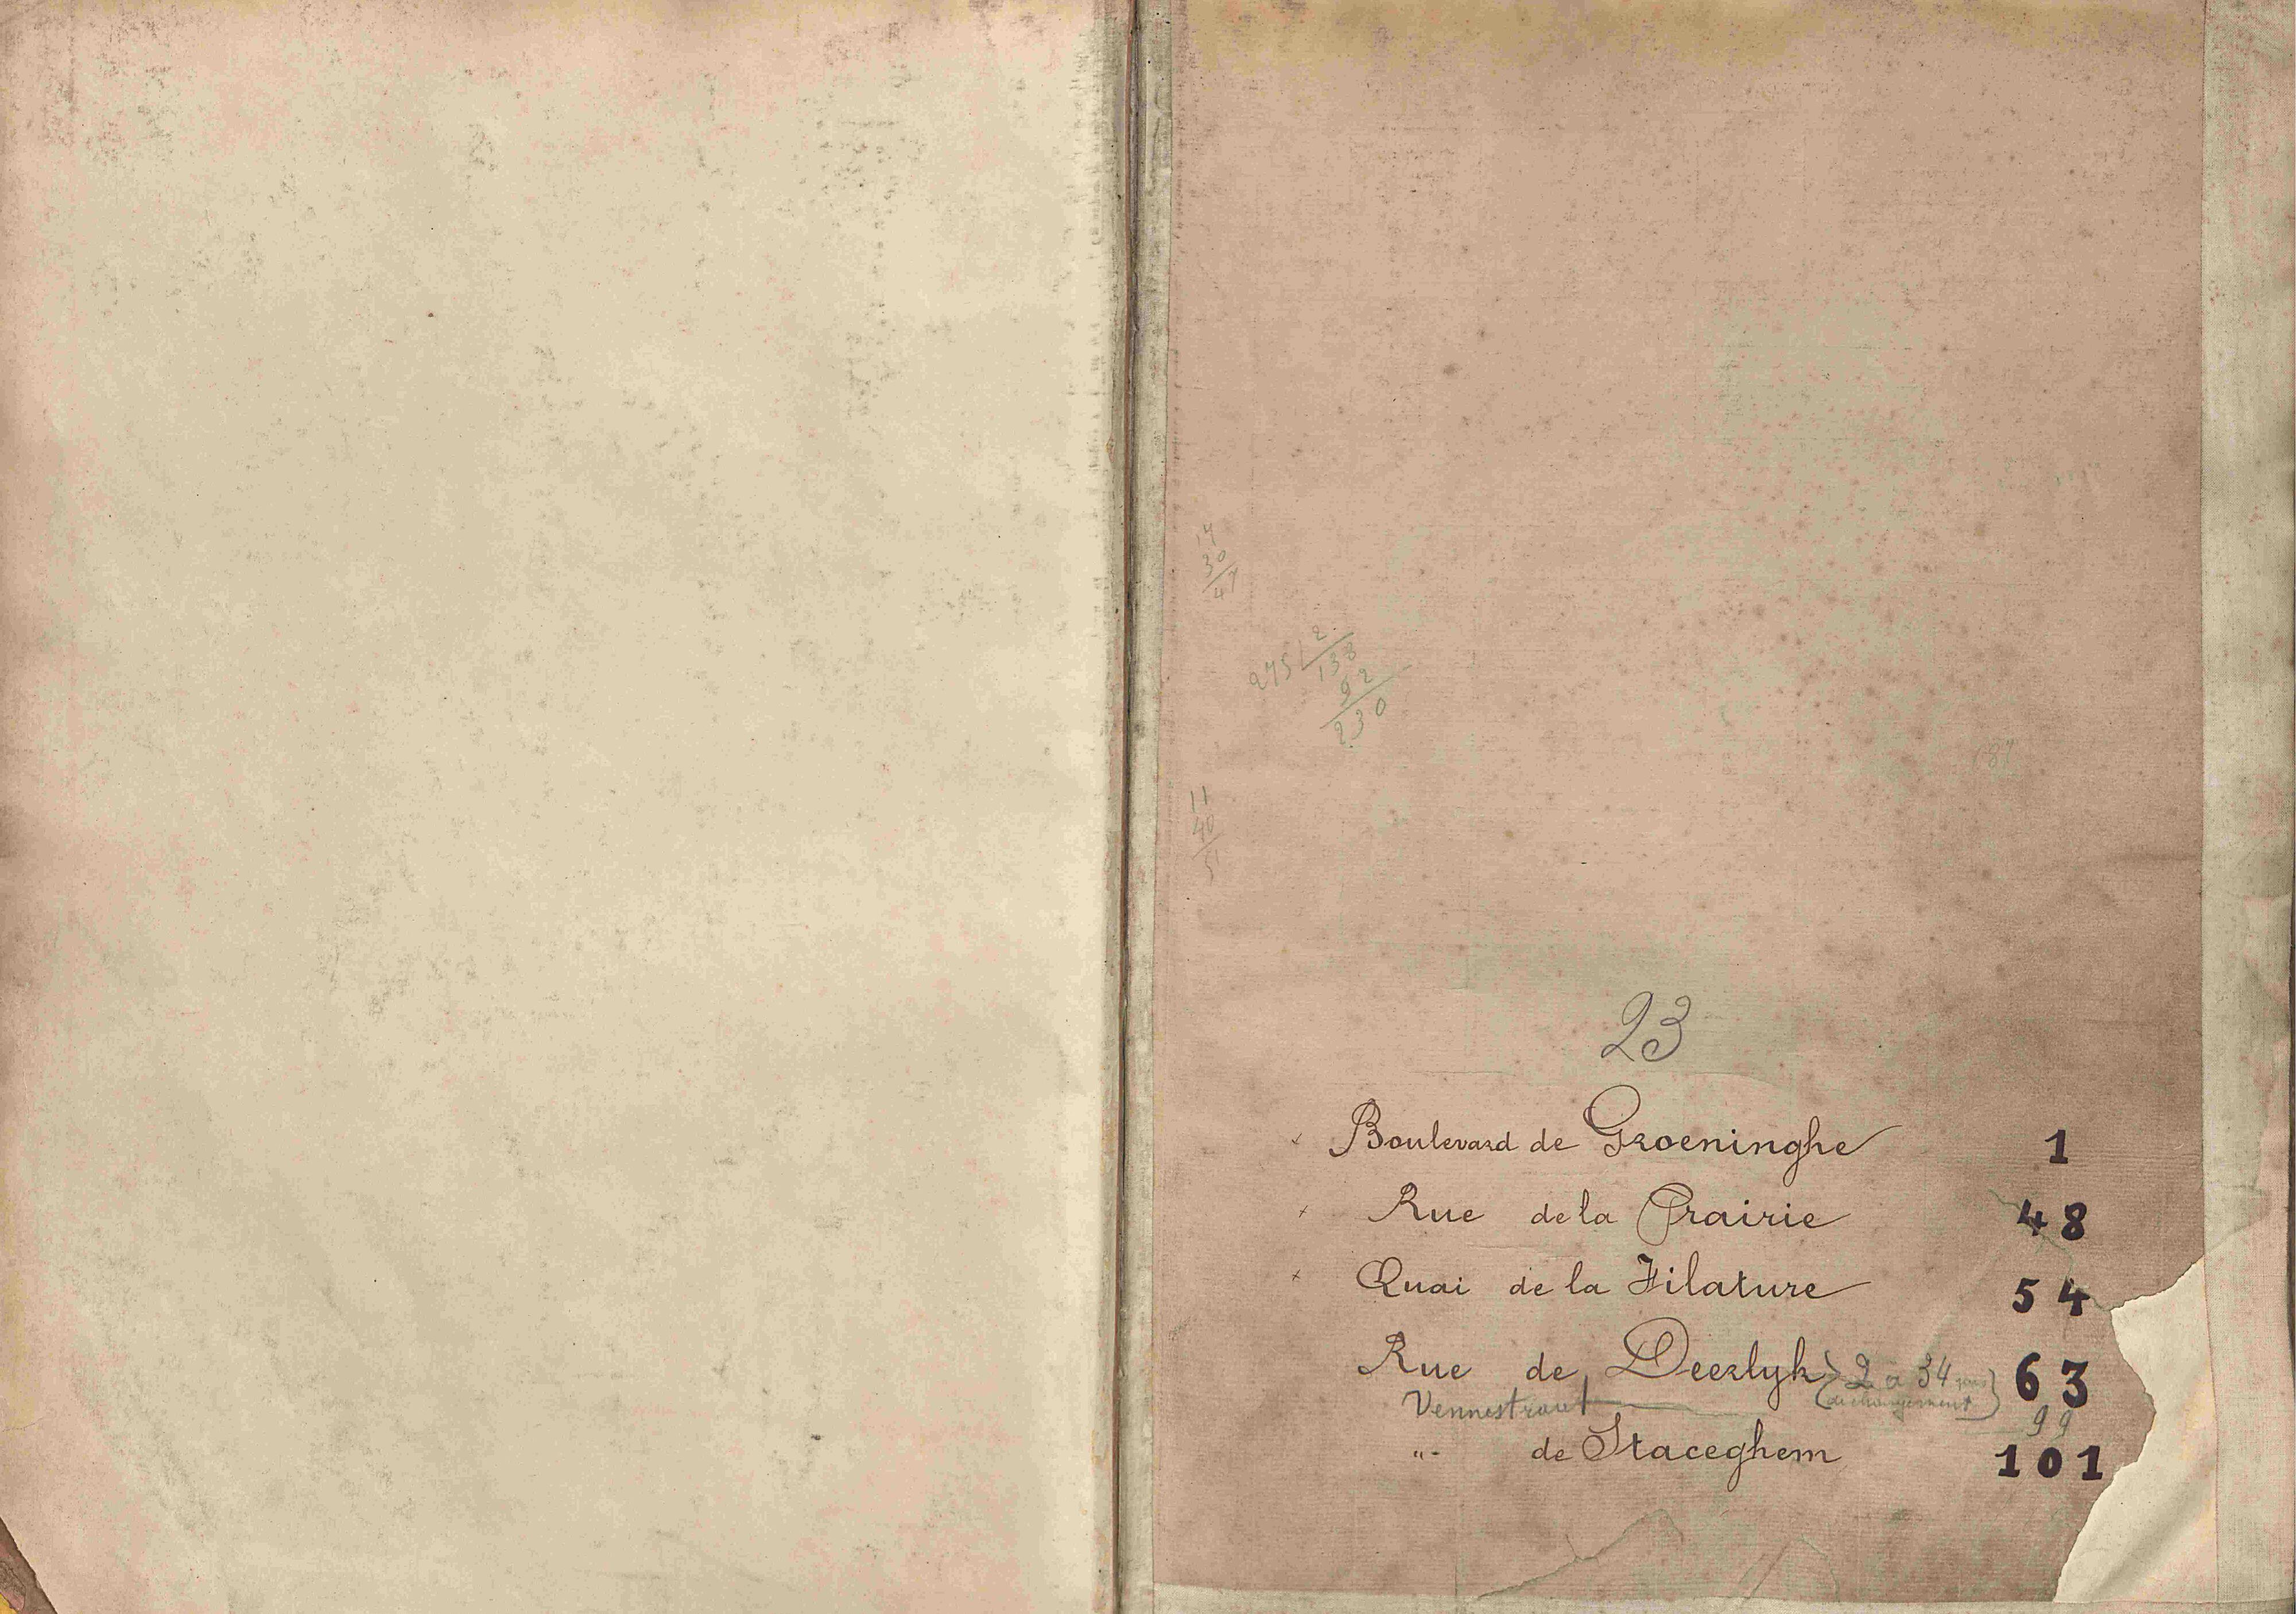 Bevolkingsregister Kortrijk 1890 boek 23